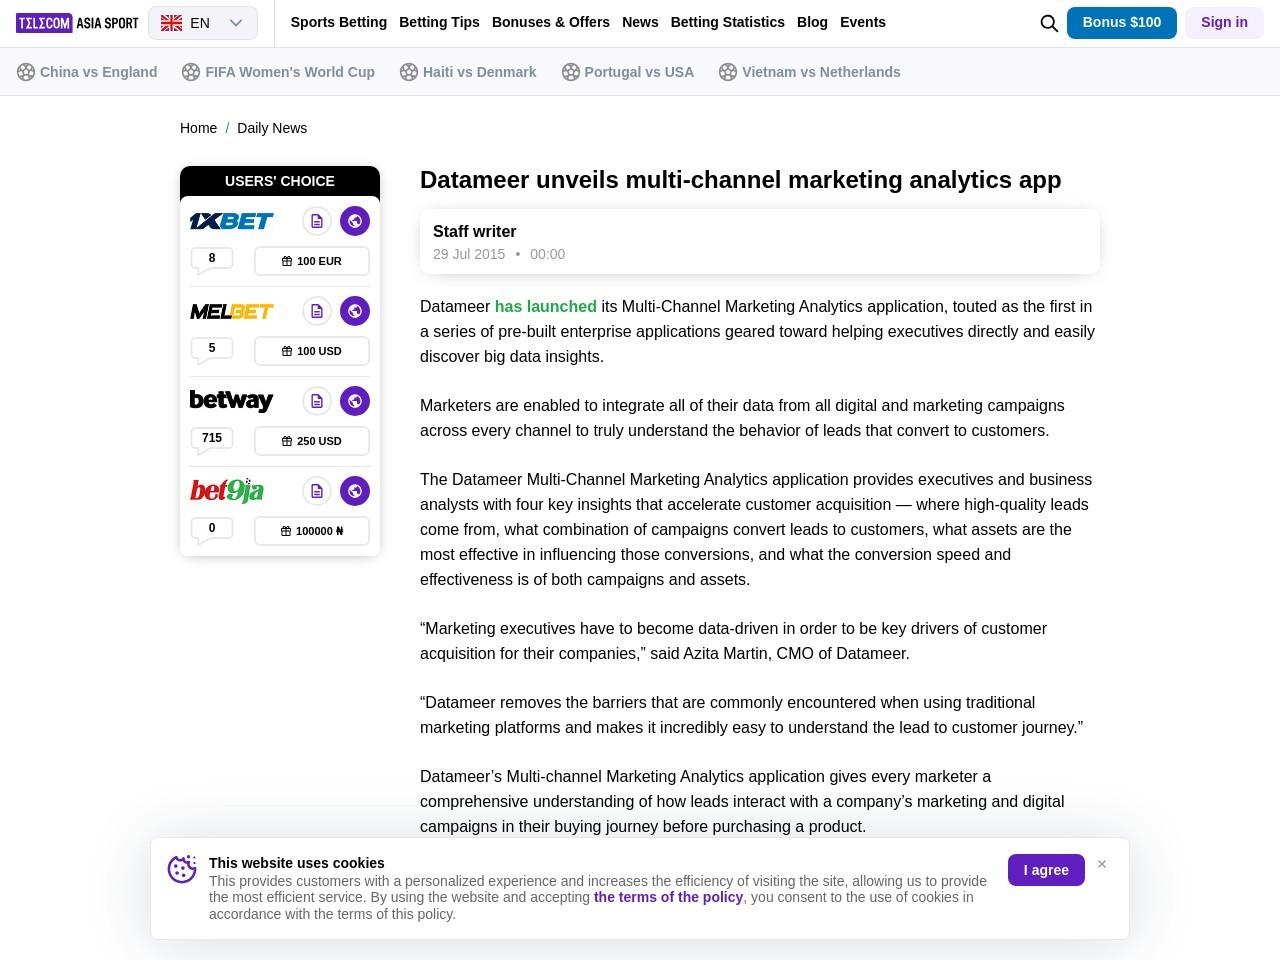 Datameer unveils multi-channel marketing analytics app